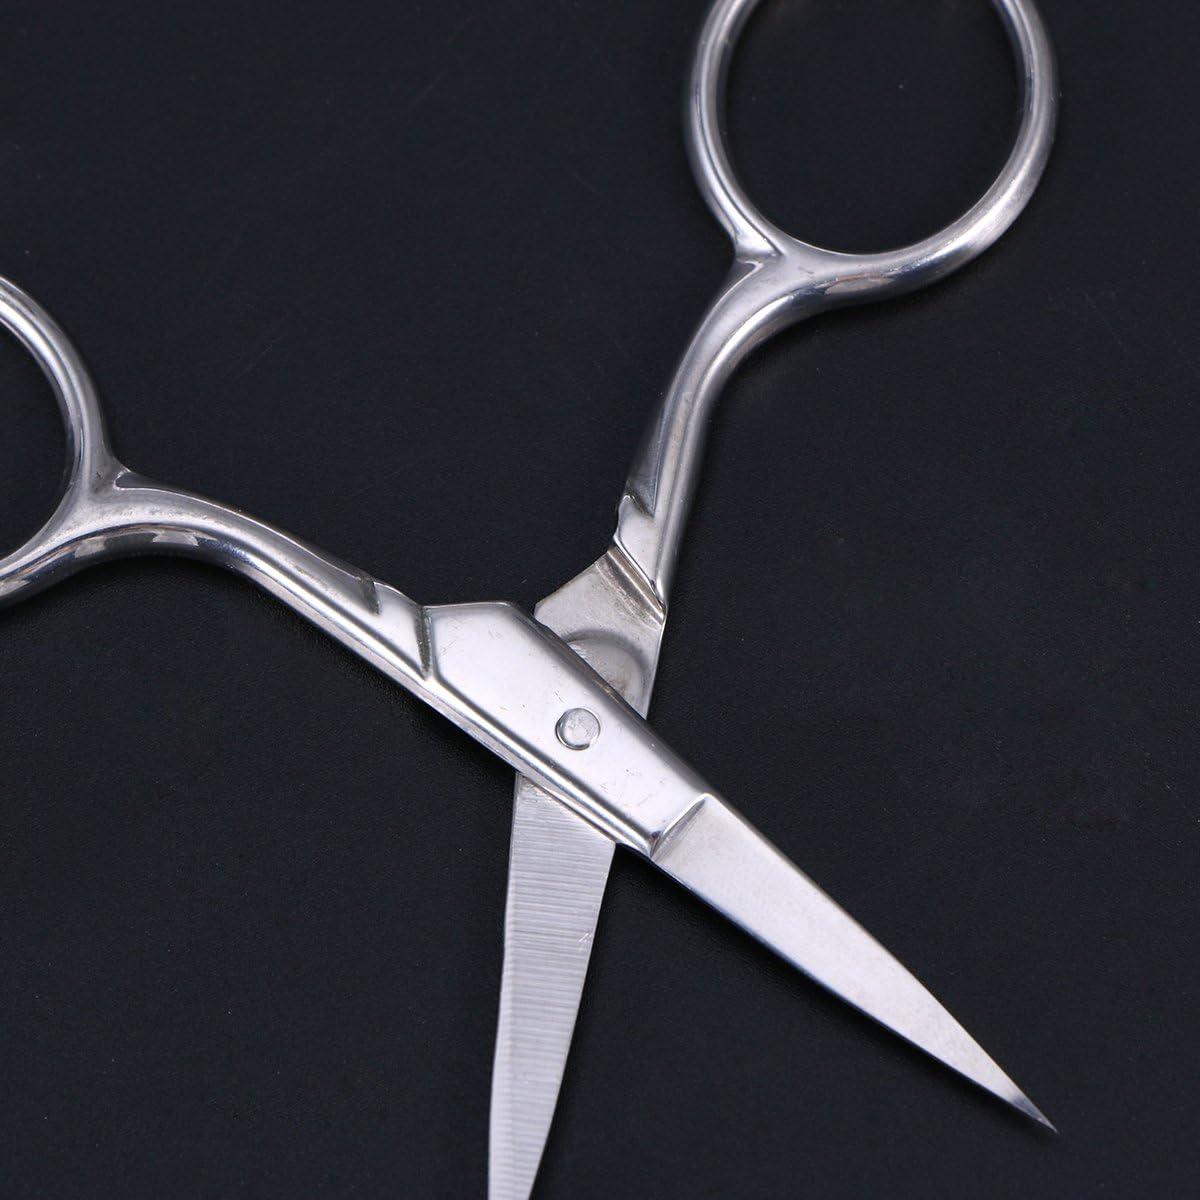 Steel Eyebrow Scissors Nose Hair Scissors Beard Eyebrow Nose Facial Hairs False with Sharp Edge Blades